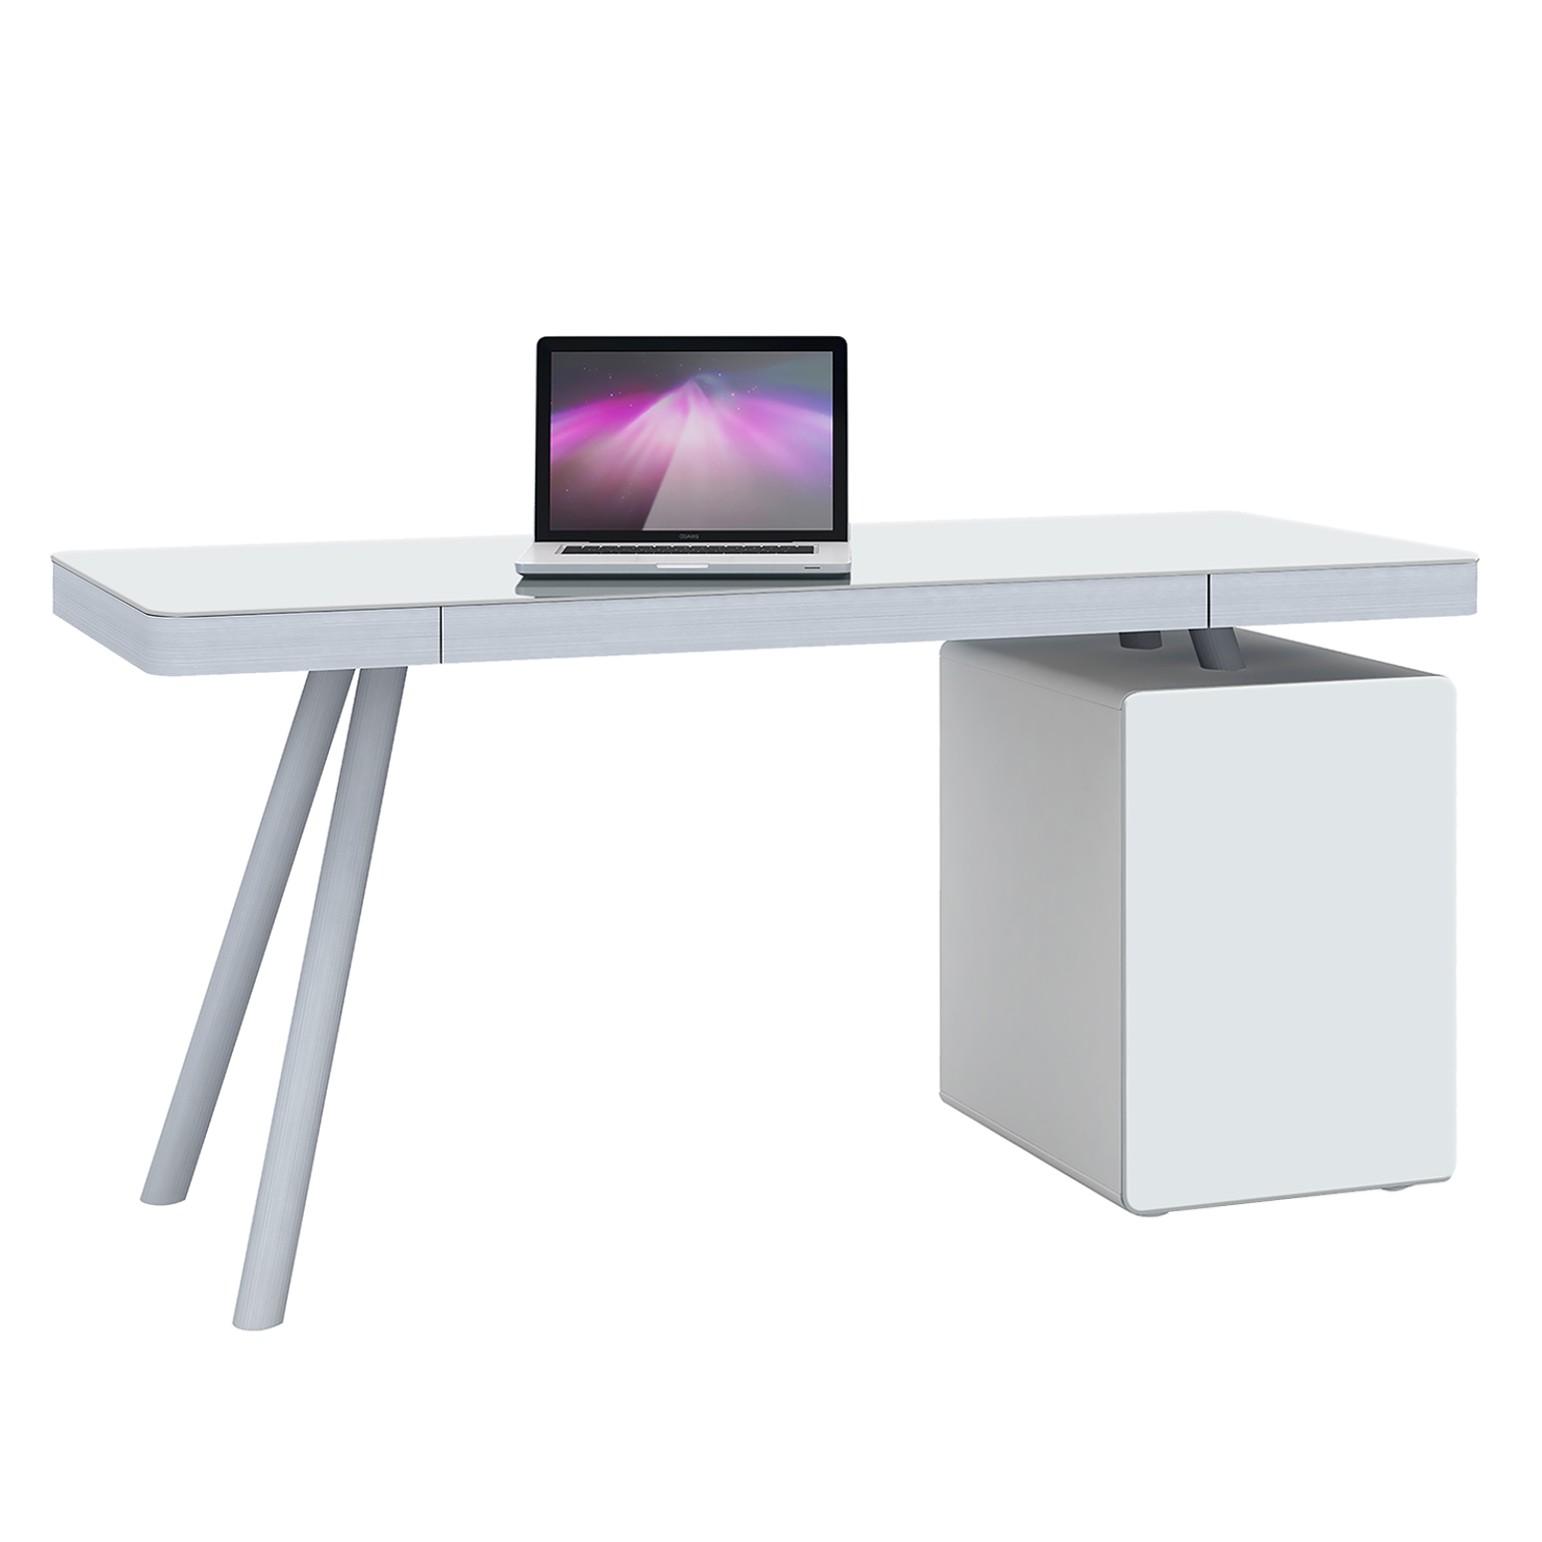 Bureau pour ordinateur Mitaka - Verre blanc / Aluminium - Blanc / Argenté mat, Maja Möbel